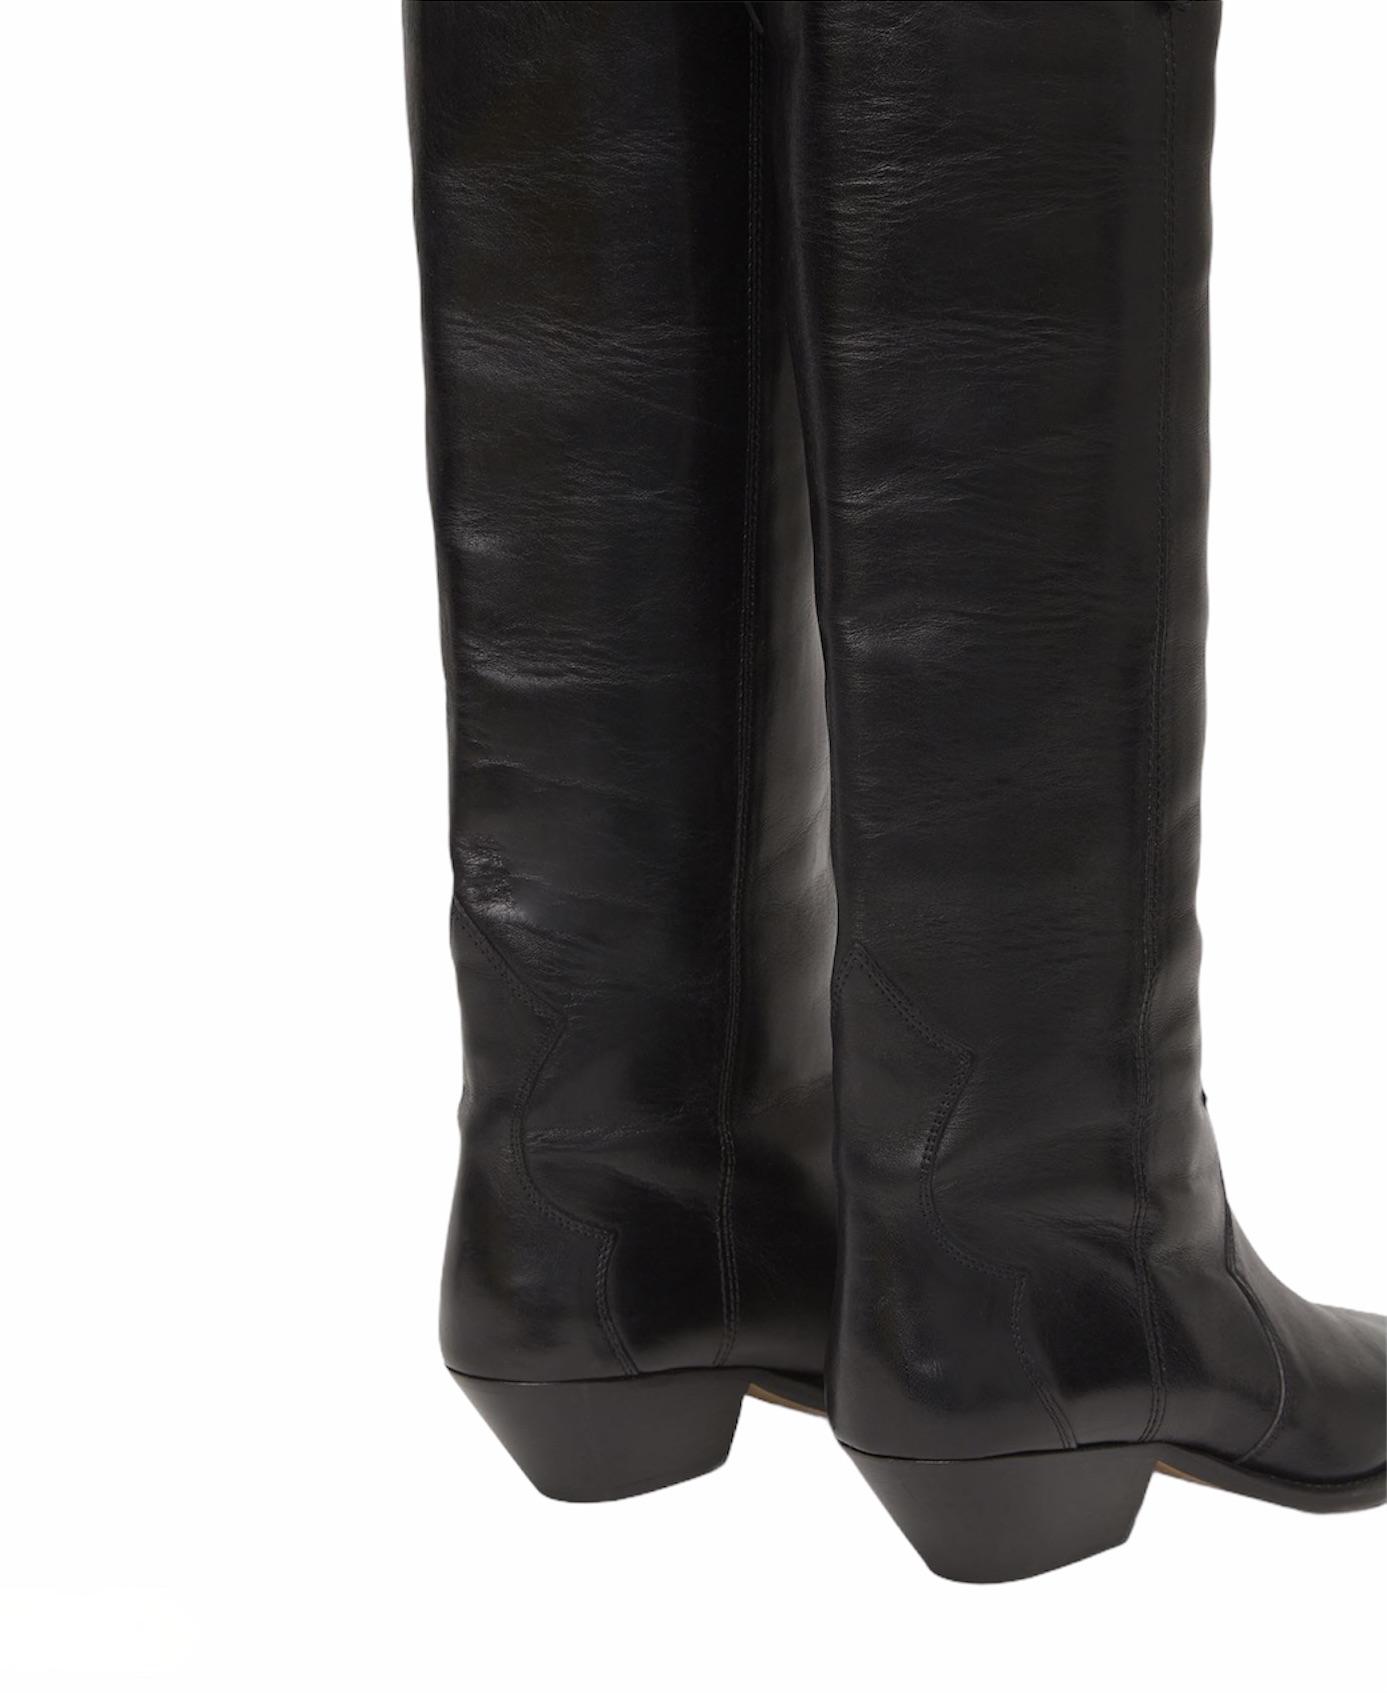 Denvee High, Boot, Isabel Marant